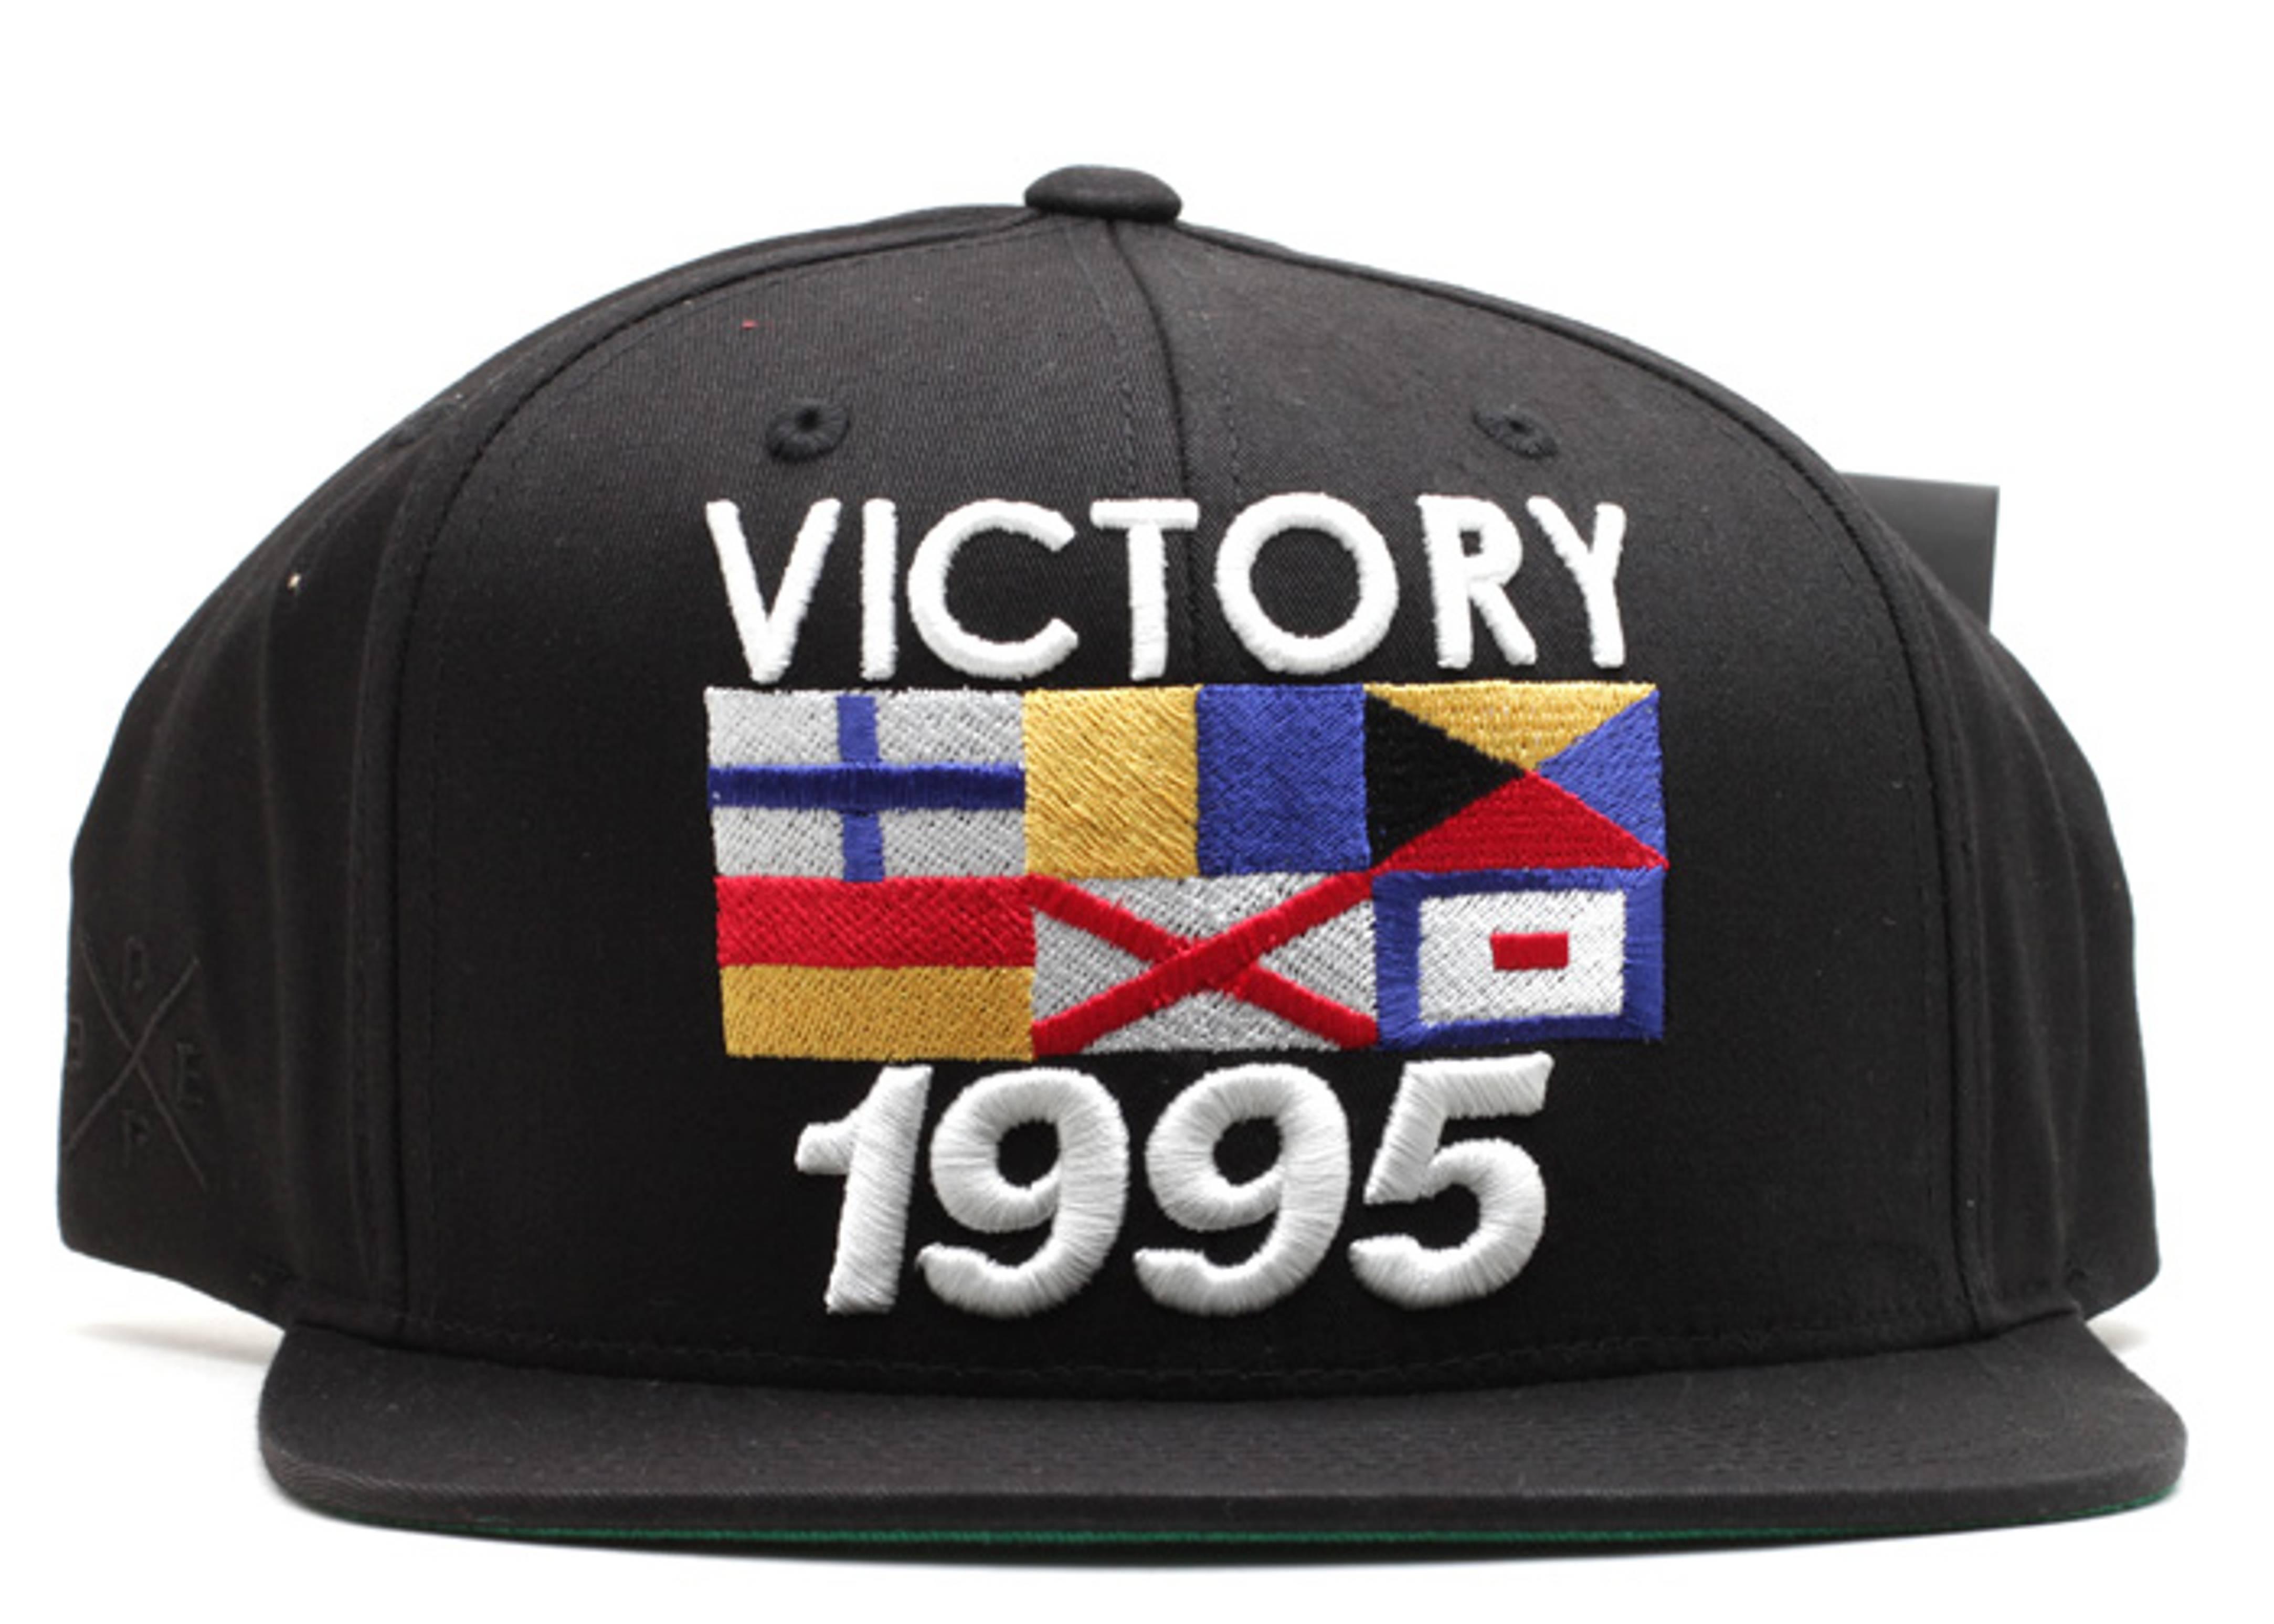 1995 victory stadium snap-back